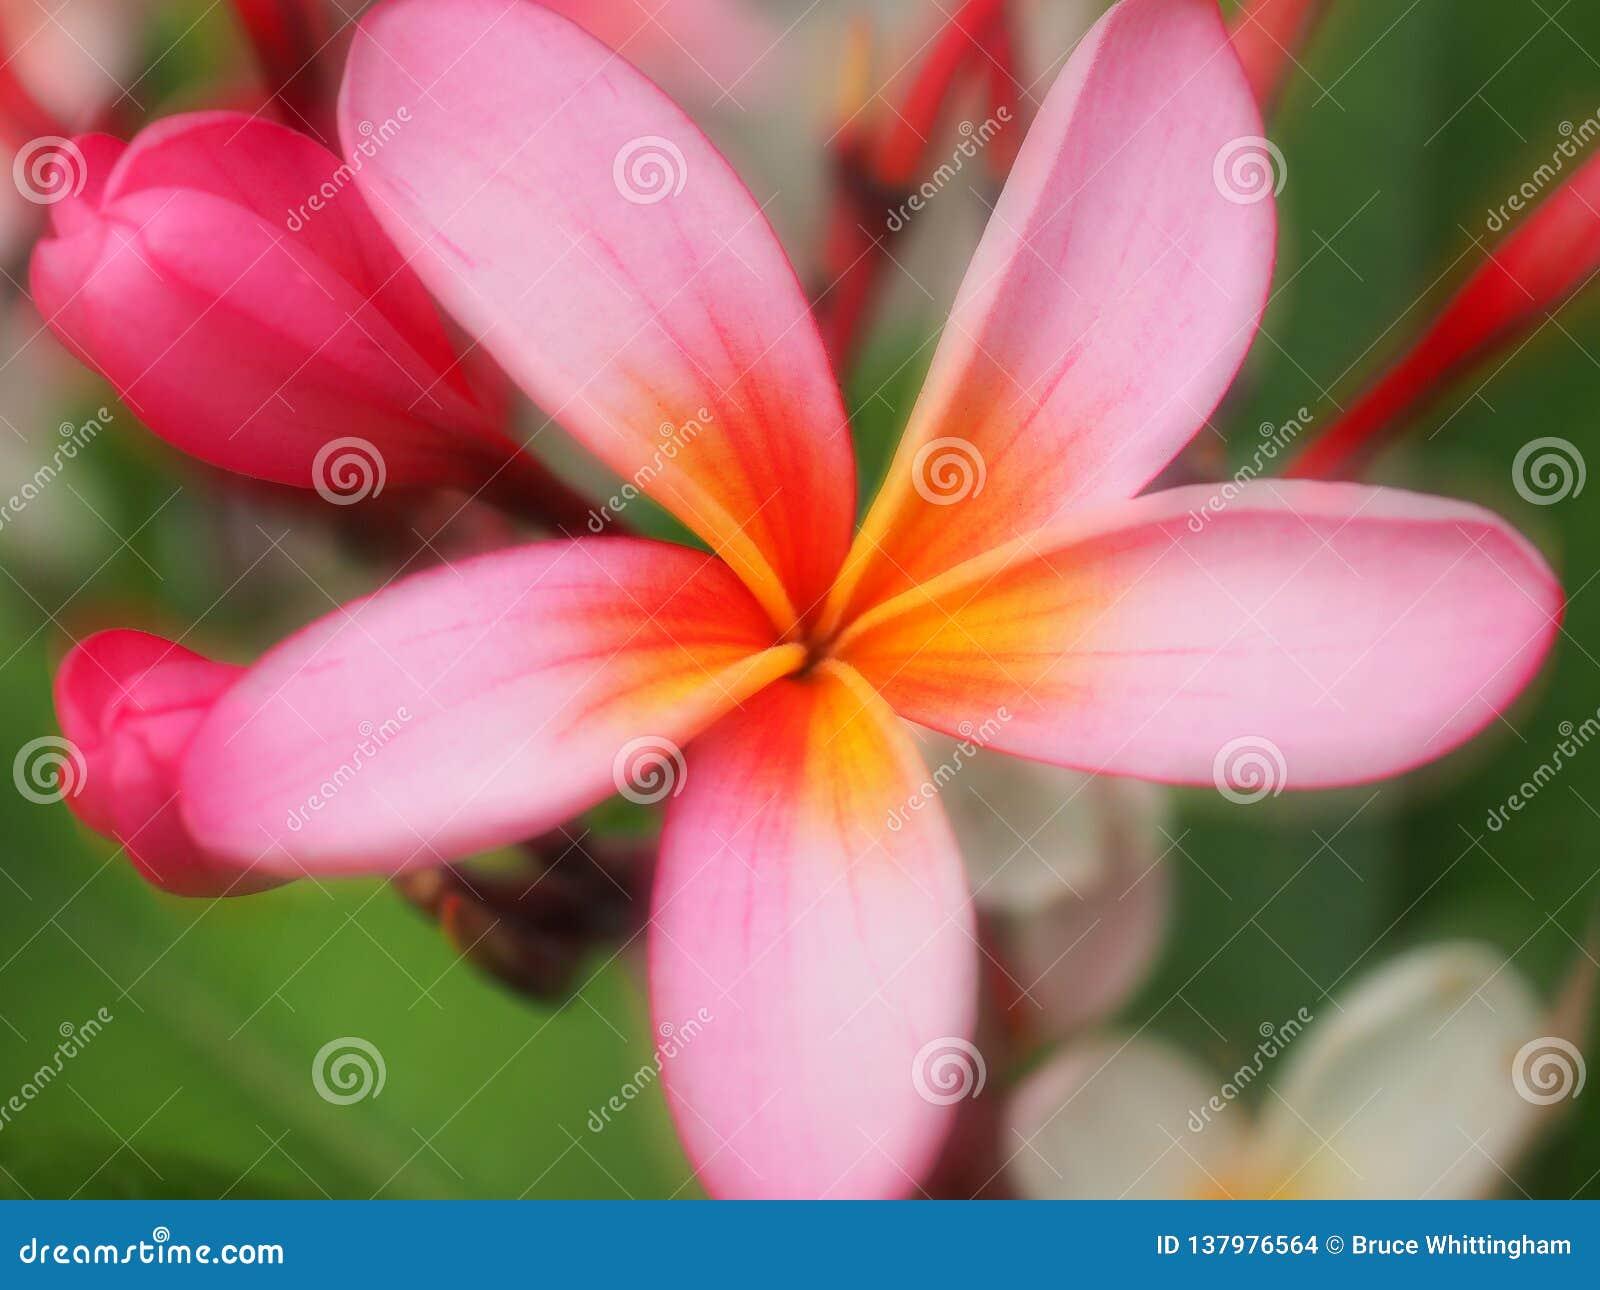 Soft Focus Pink Frangipani Flower